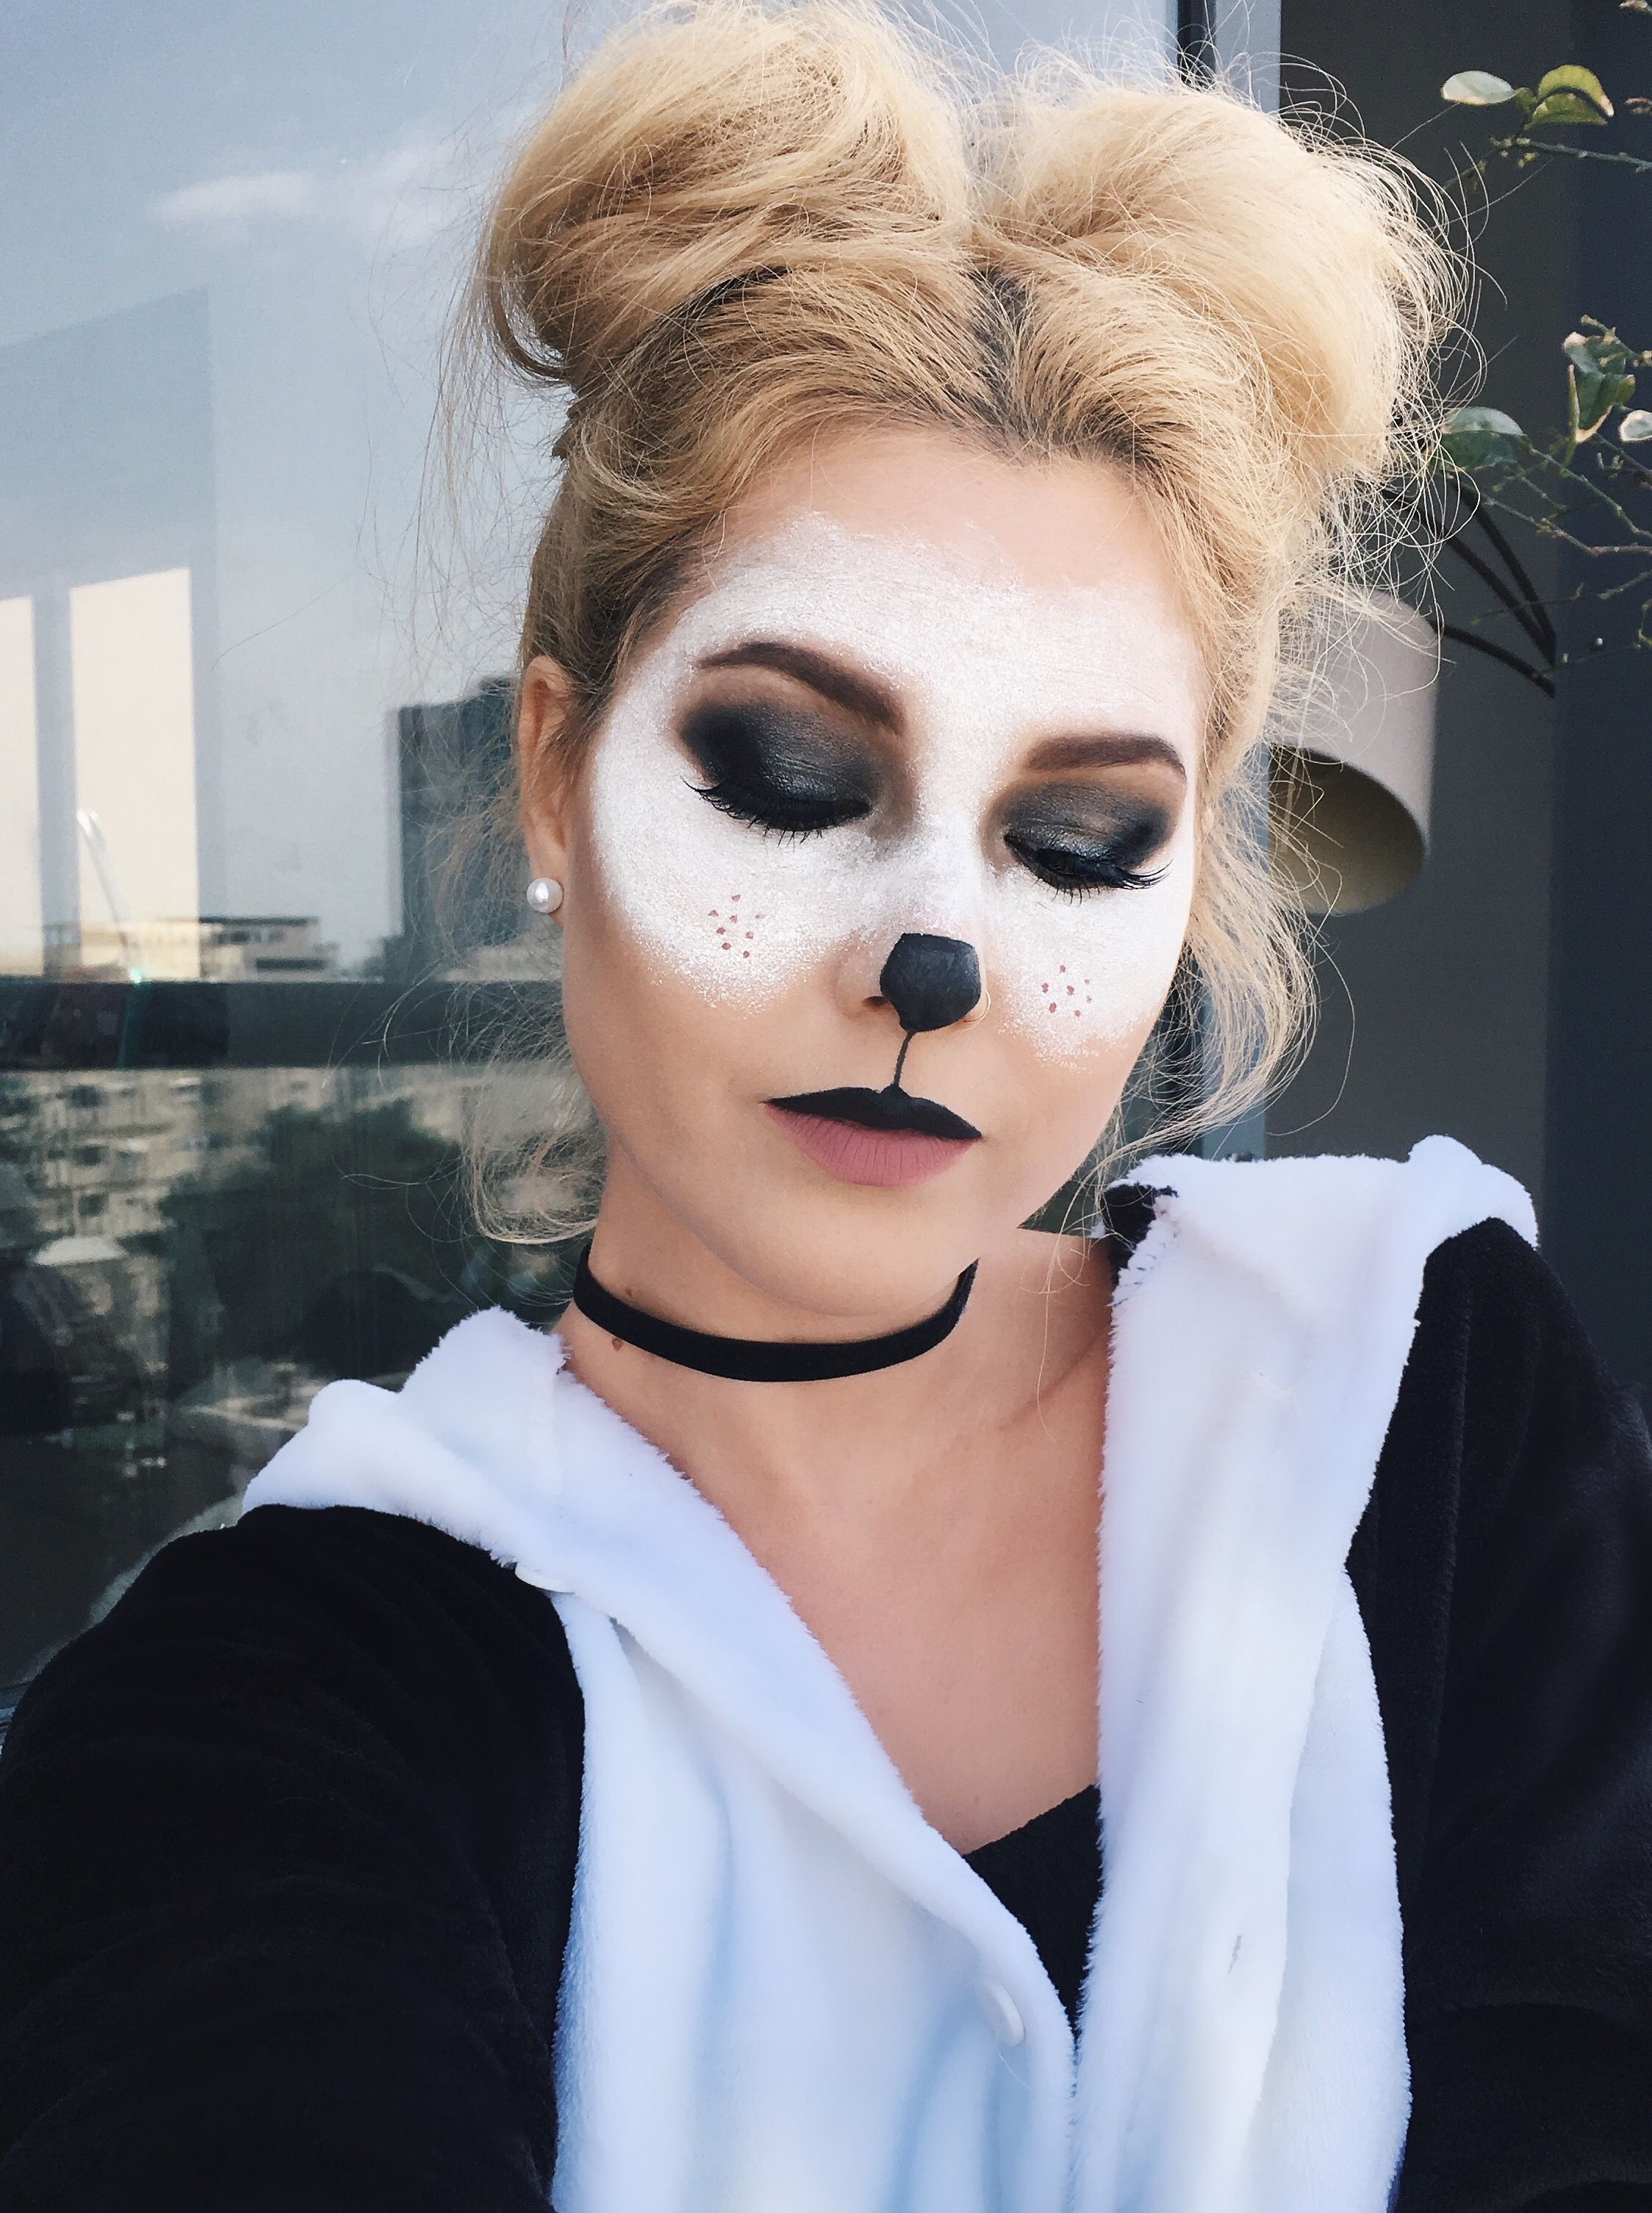 panda halloween costume make up girl halloween costume makeup onesie holiday hairstyle happy